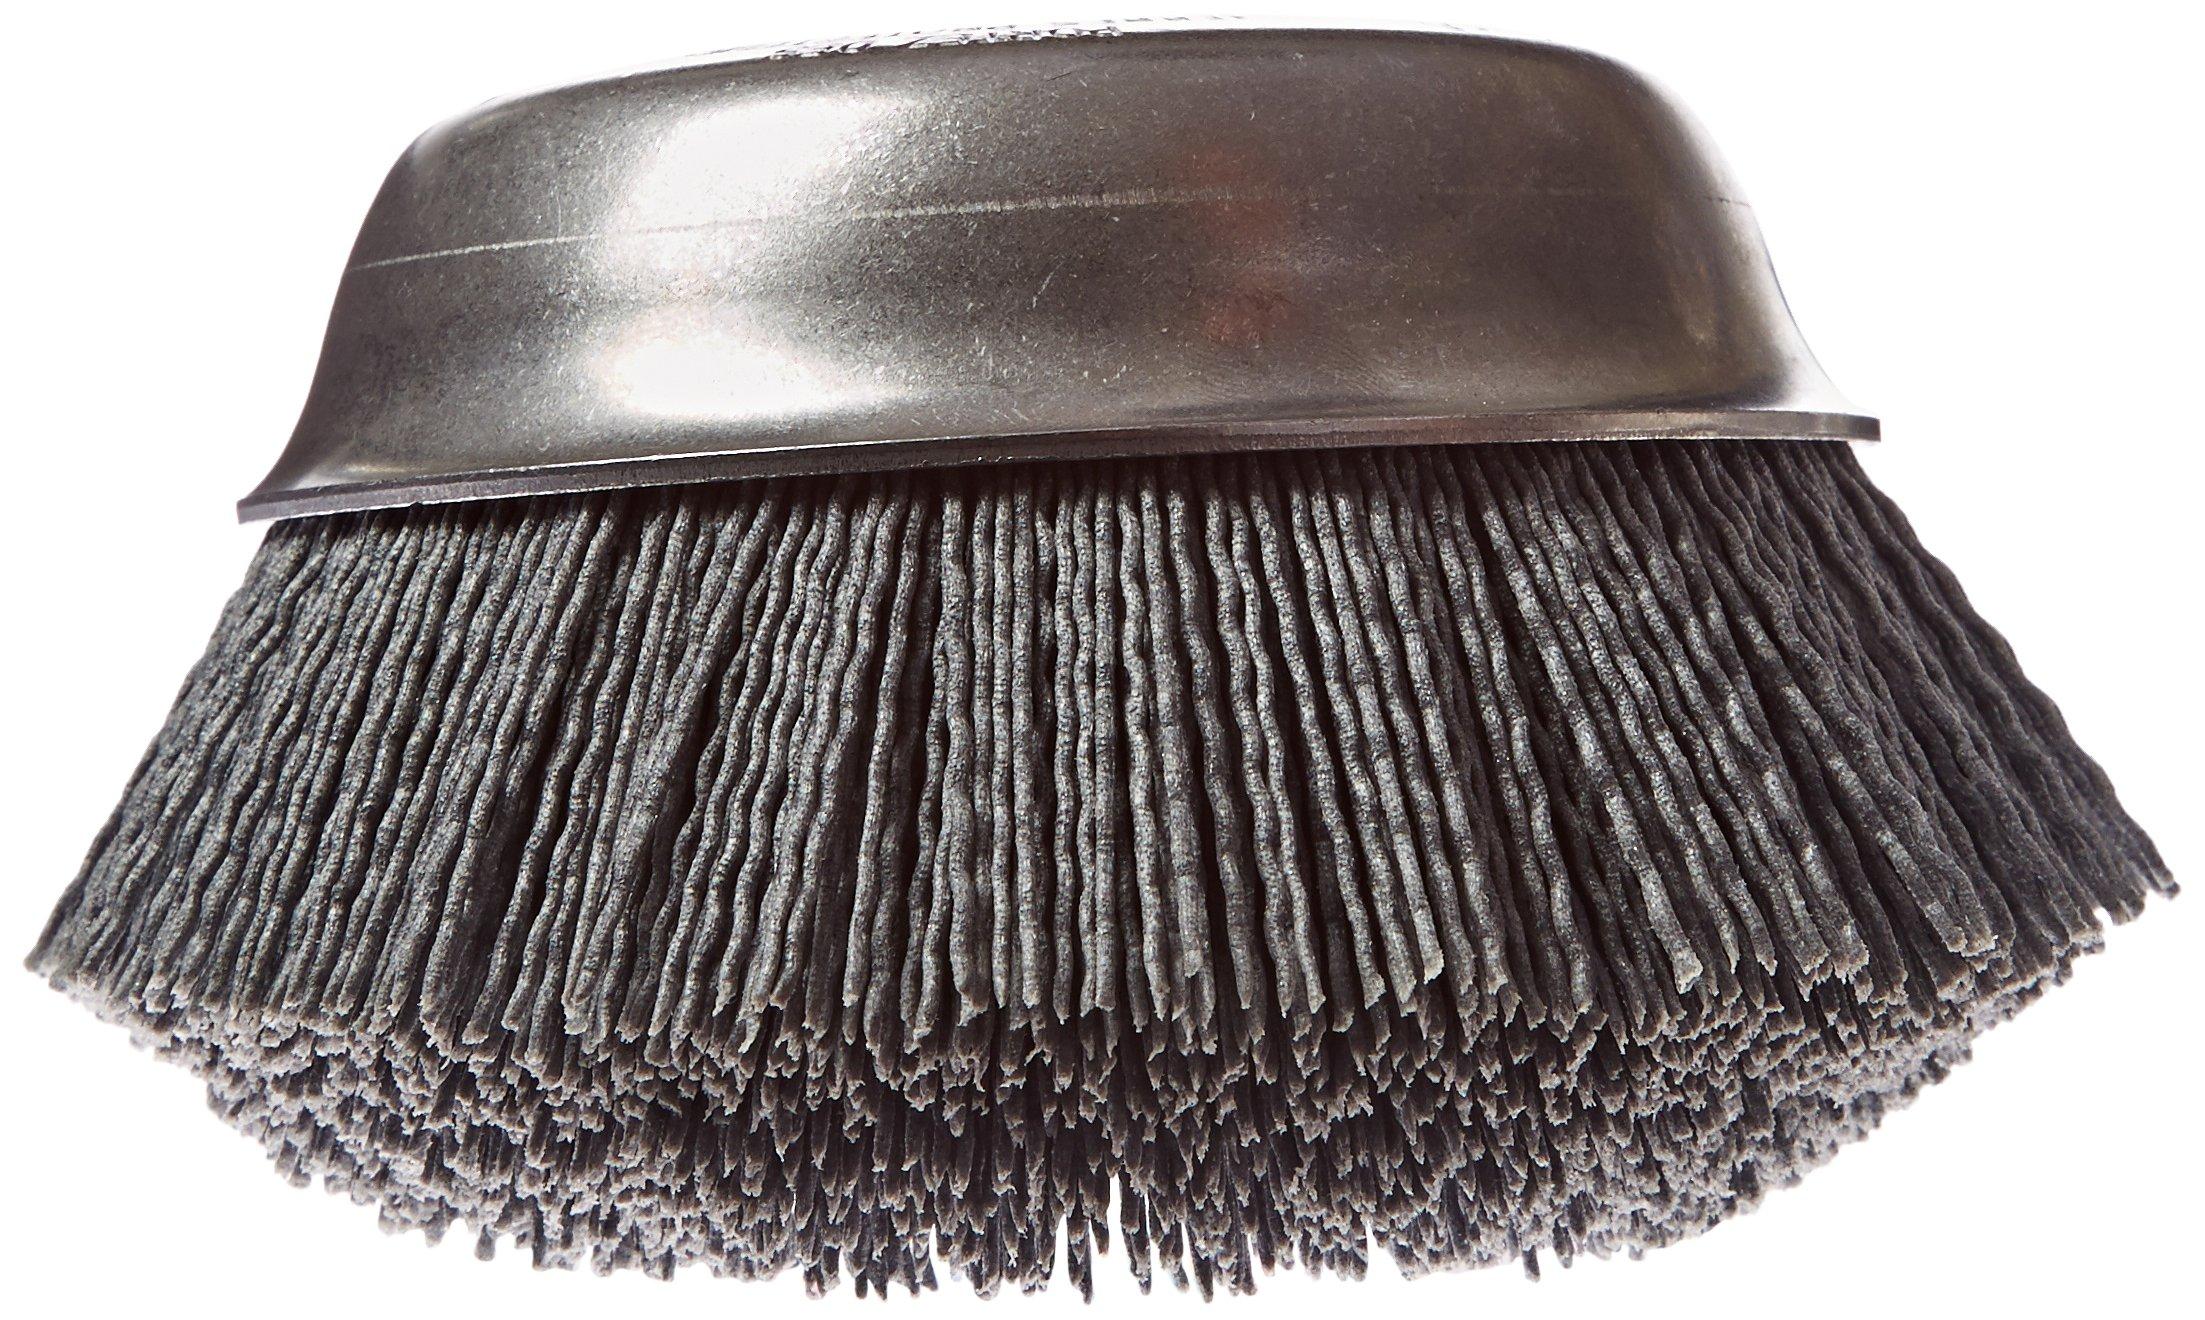 Osborn 00032131SP 32131Sp Abrasive Cup Brush, Silicon Carbide, 6000 RPM by Osborn